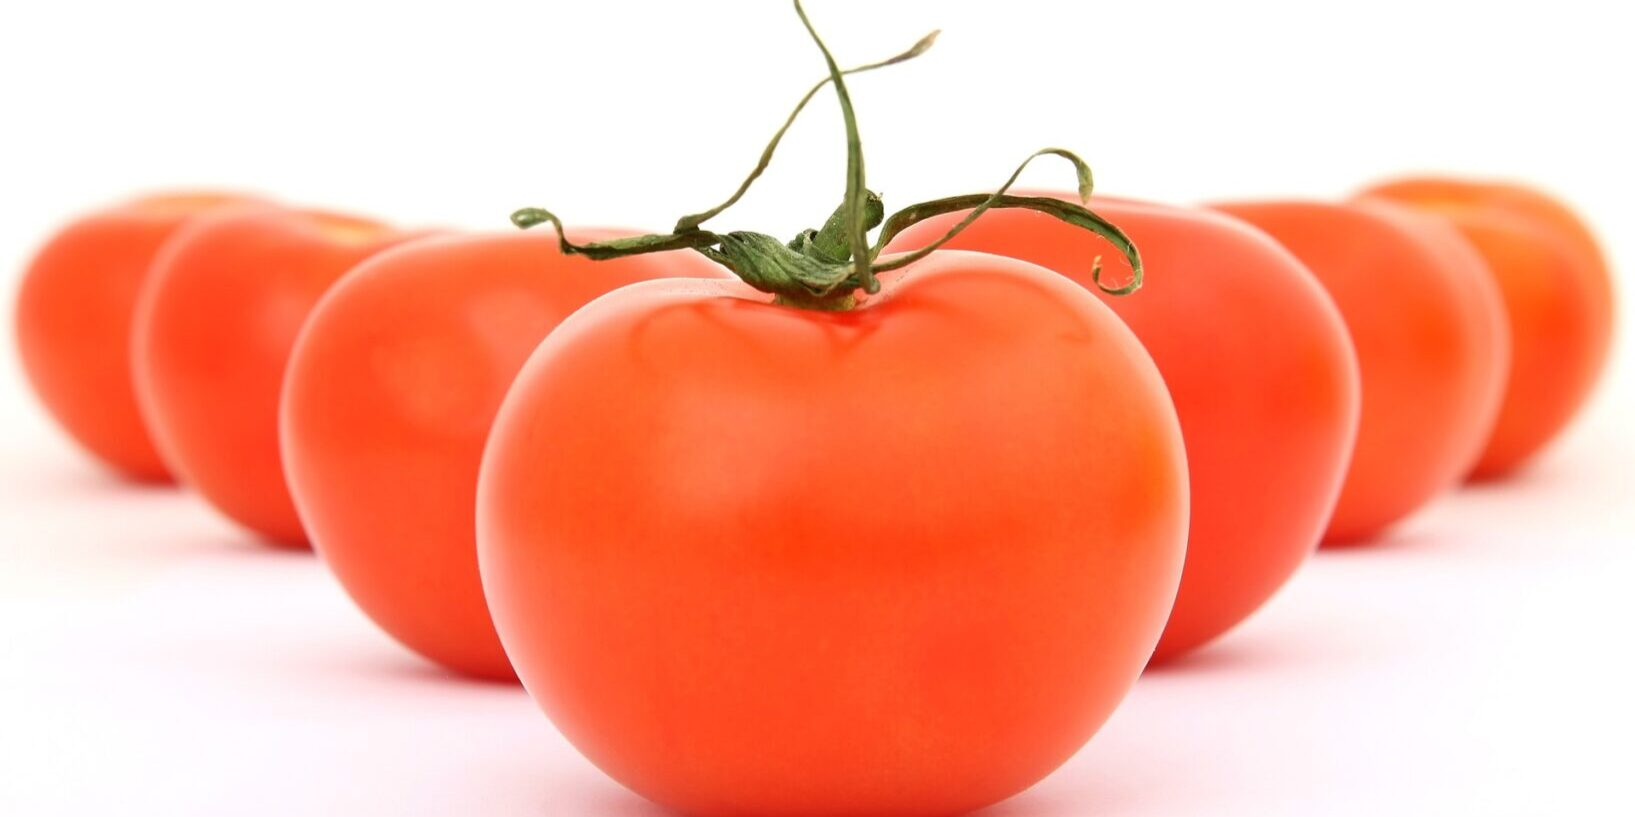 tomatoes-1239177_1920